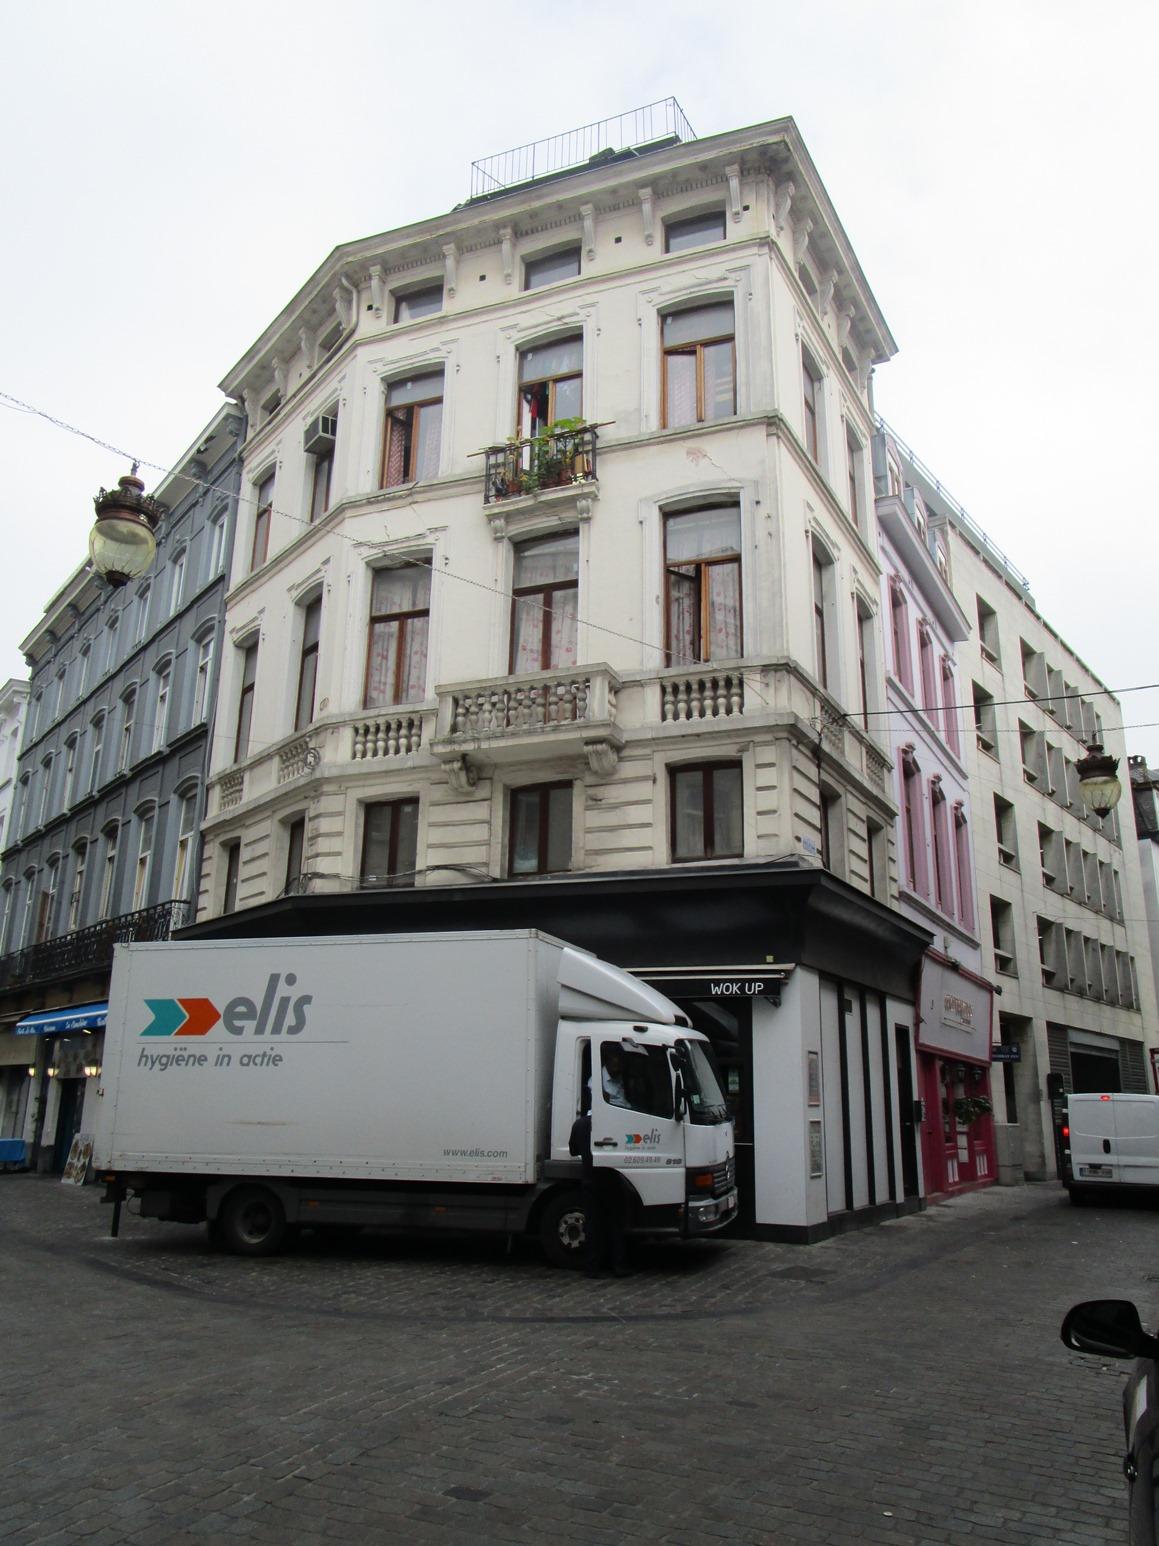 Greepstraat 36, 2015